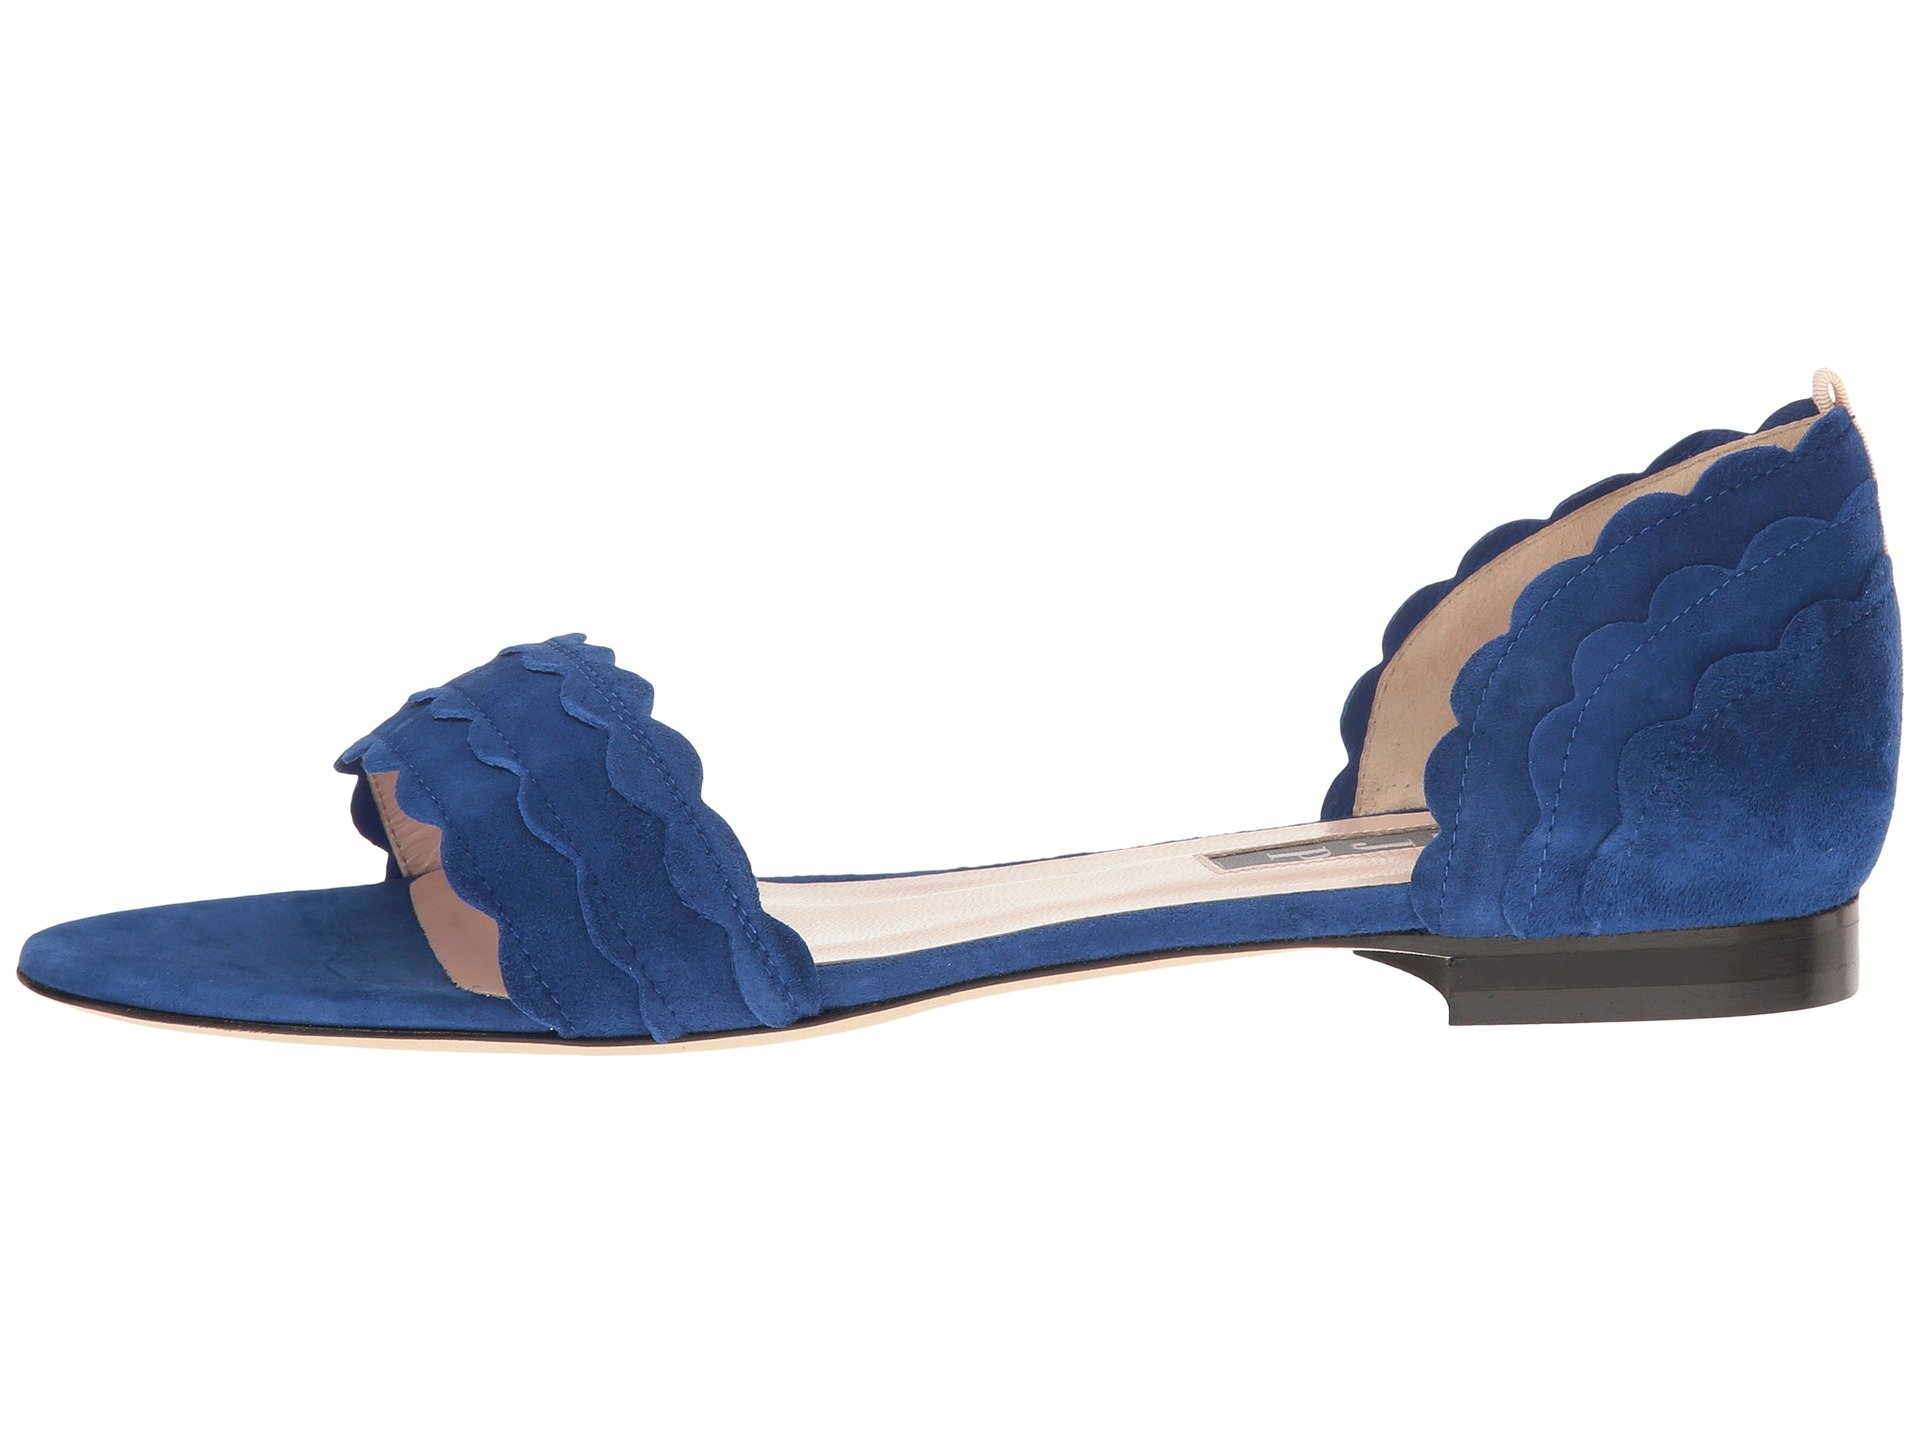 SJP by Sarah Jessica Parker Damenschuhe Bobbiefla Open Toe, Blau Suede, Größe 7.0 GYt6